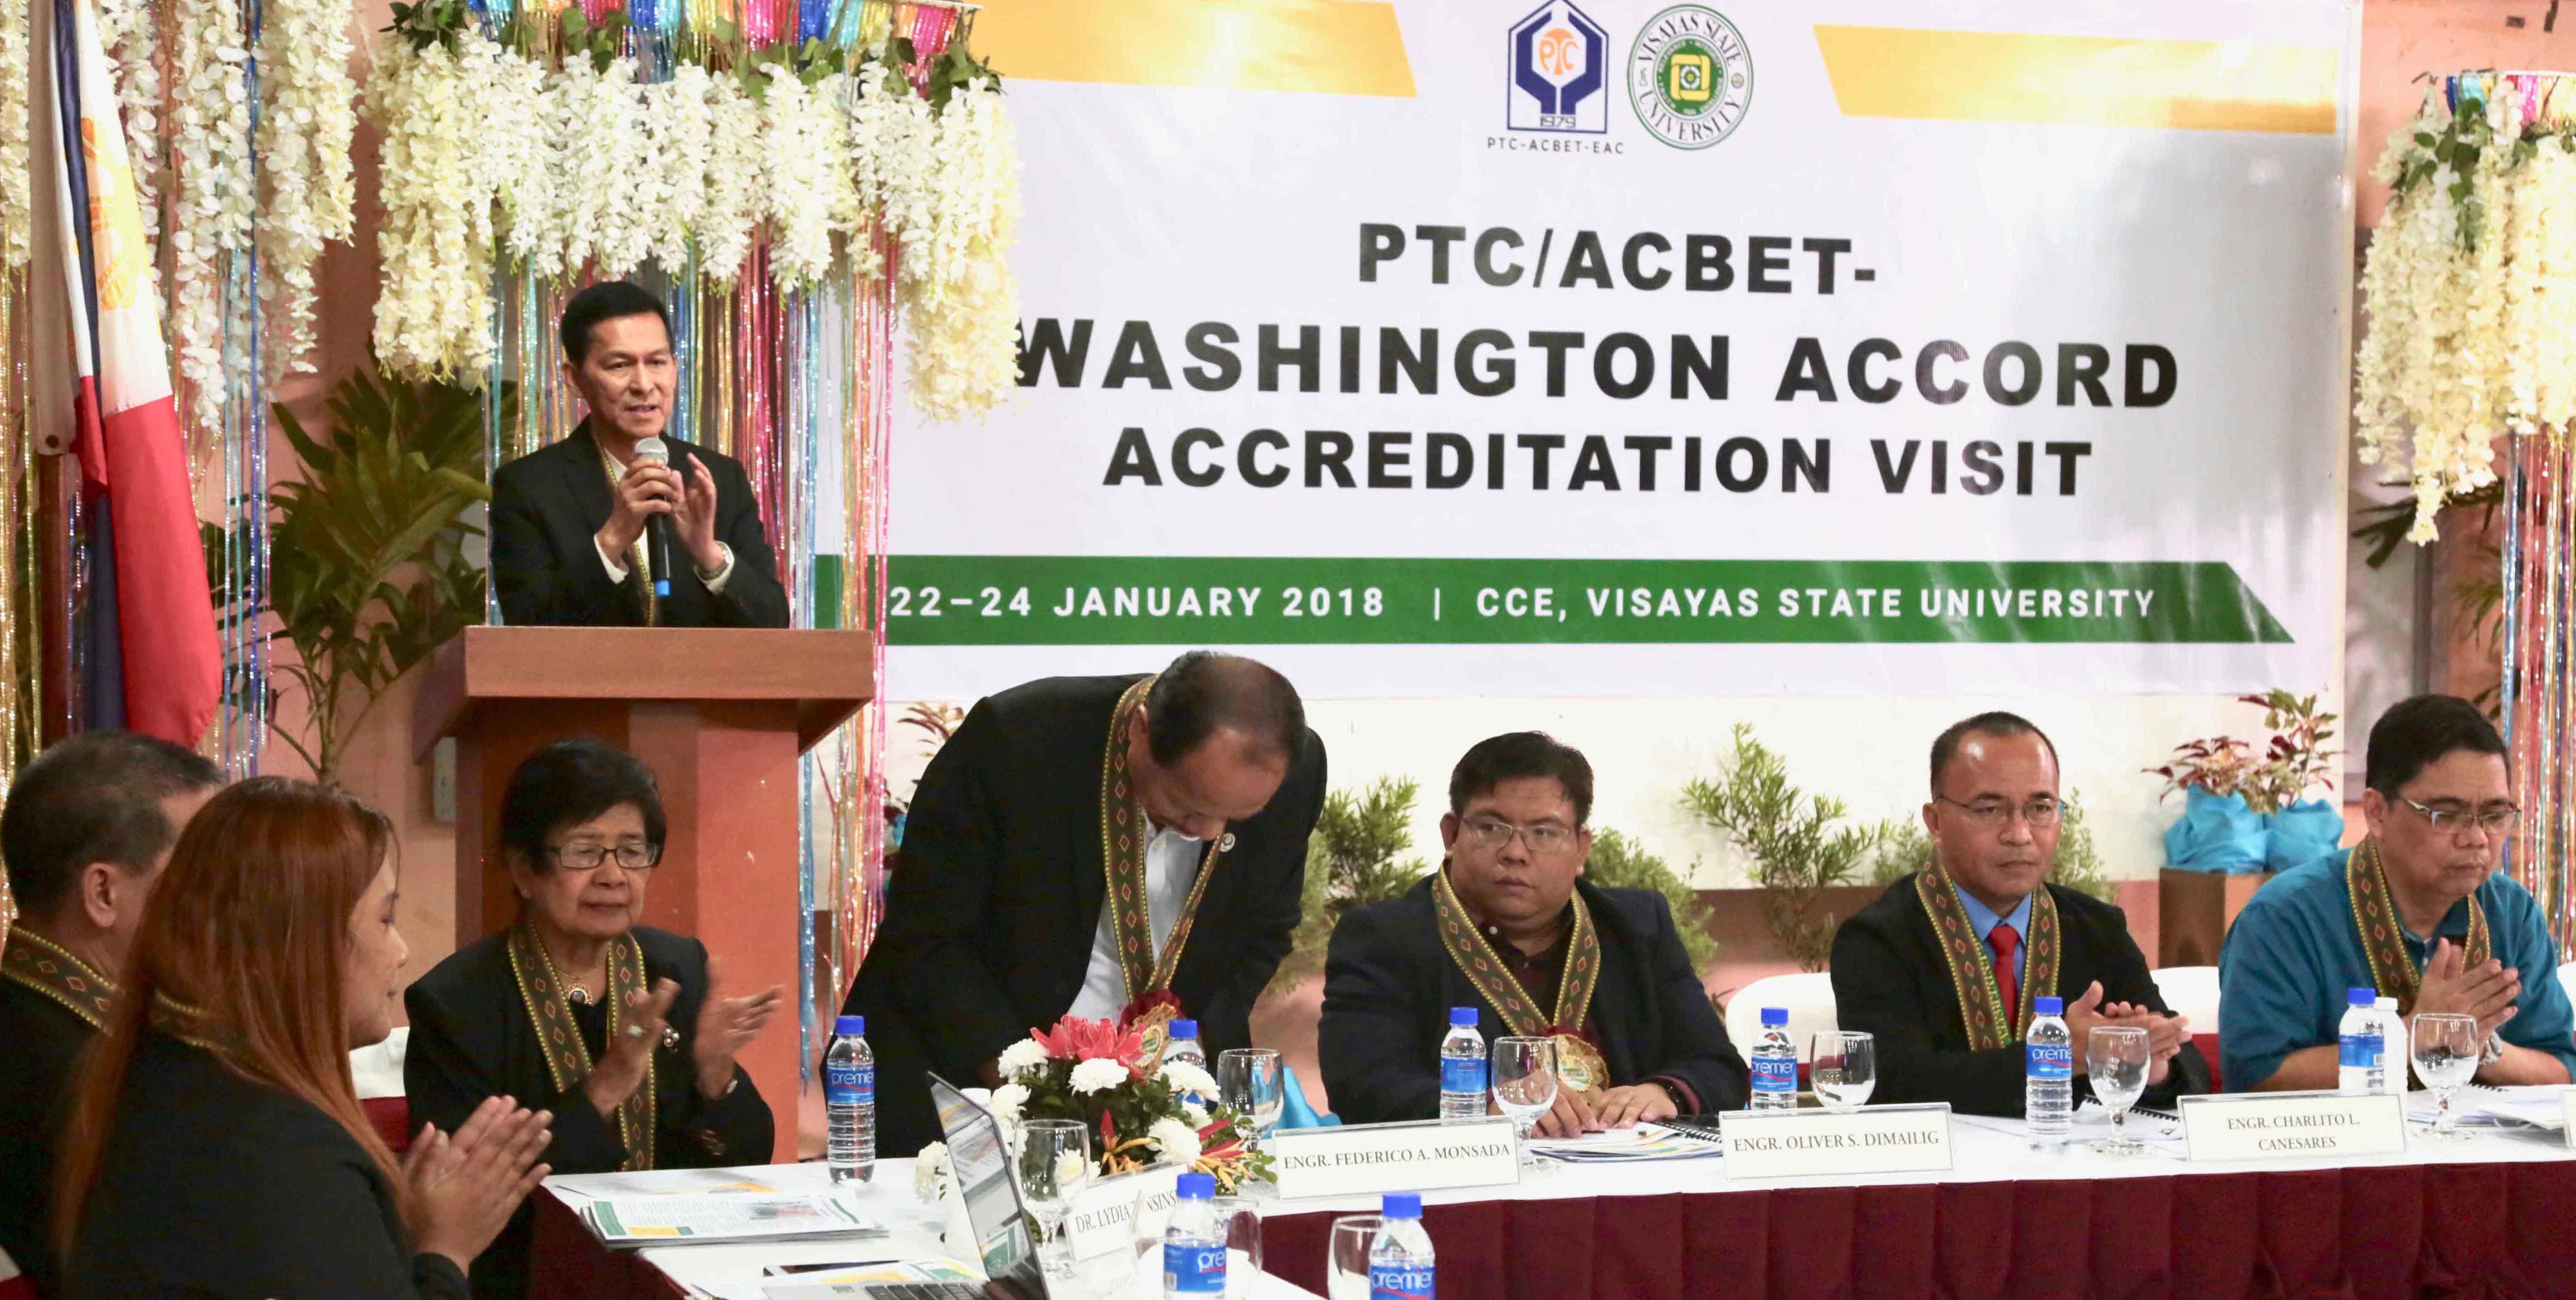 Vsu Caps Off Ptc Acbet Accreditation Visayas State University